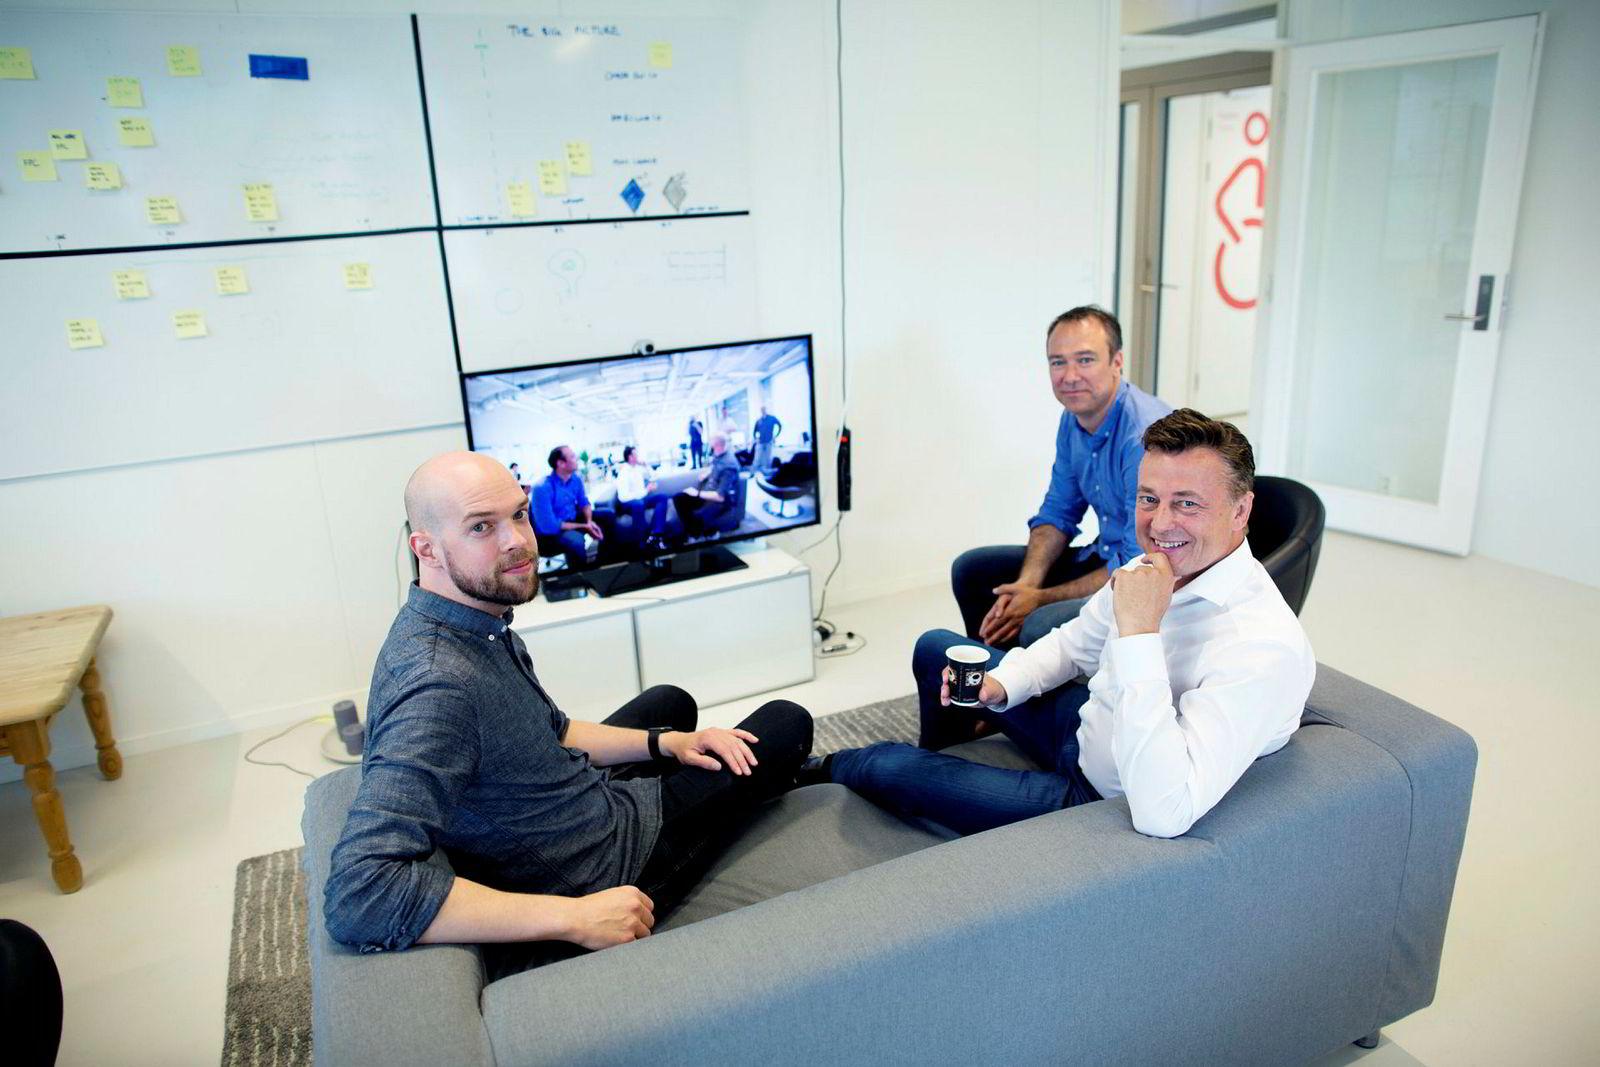 Fra venstre produktsjef og gründer Stein Ove Eriksen, tidligere administrerende direktør Thomas C. Holst og gründer Anders Eikenes i 2016.